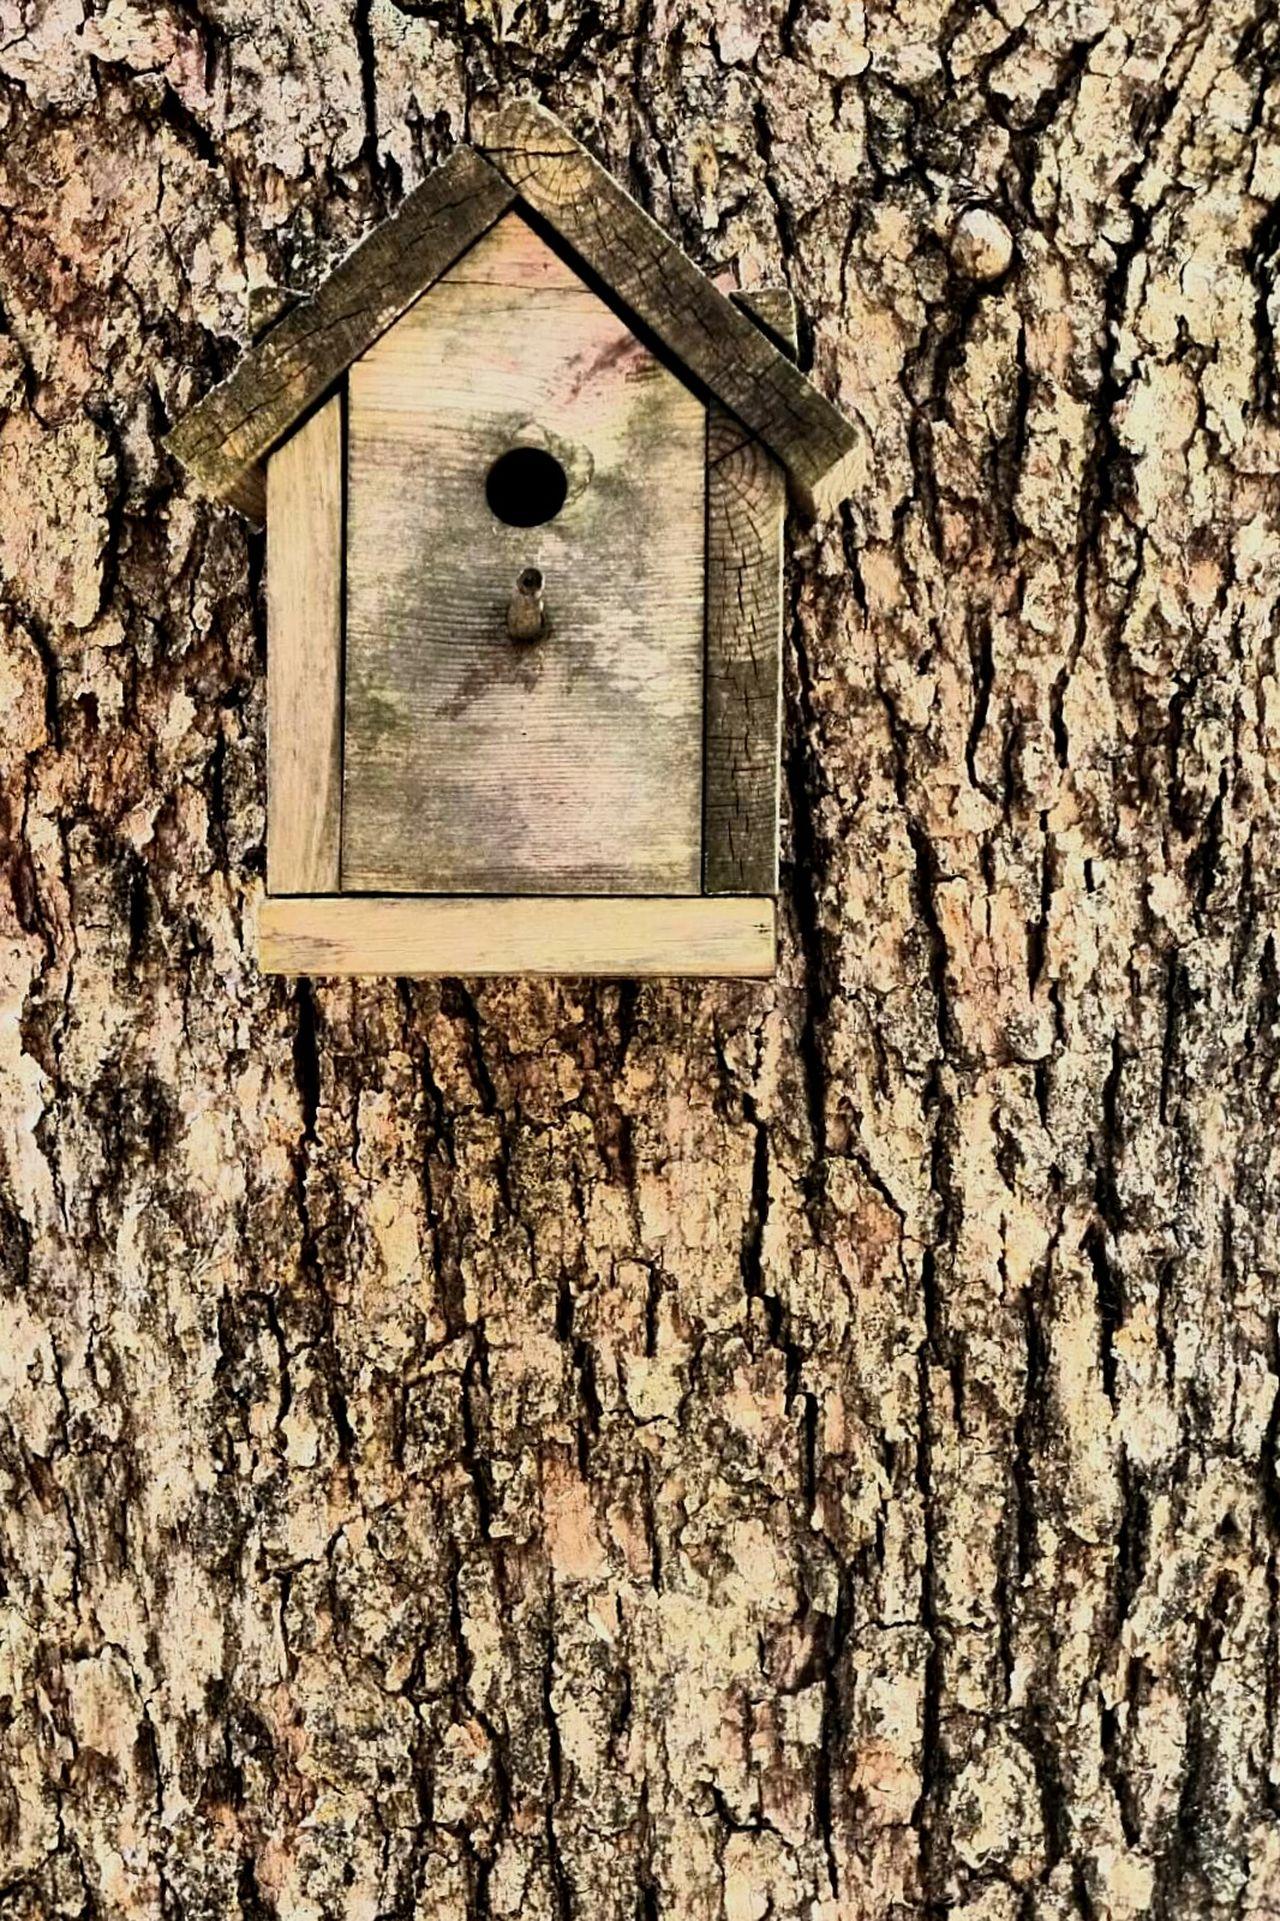 Tree_collection  Birdhouse Treebark Wood Manvsnature  ManmadeVsNature Manmade